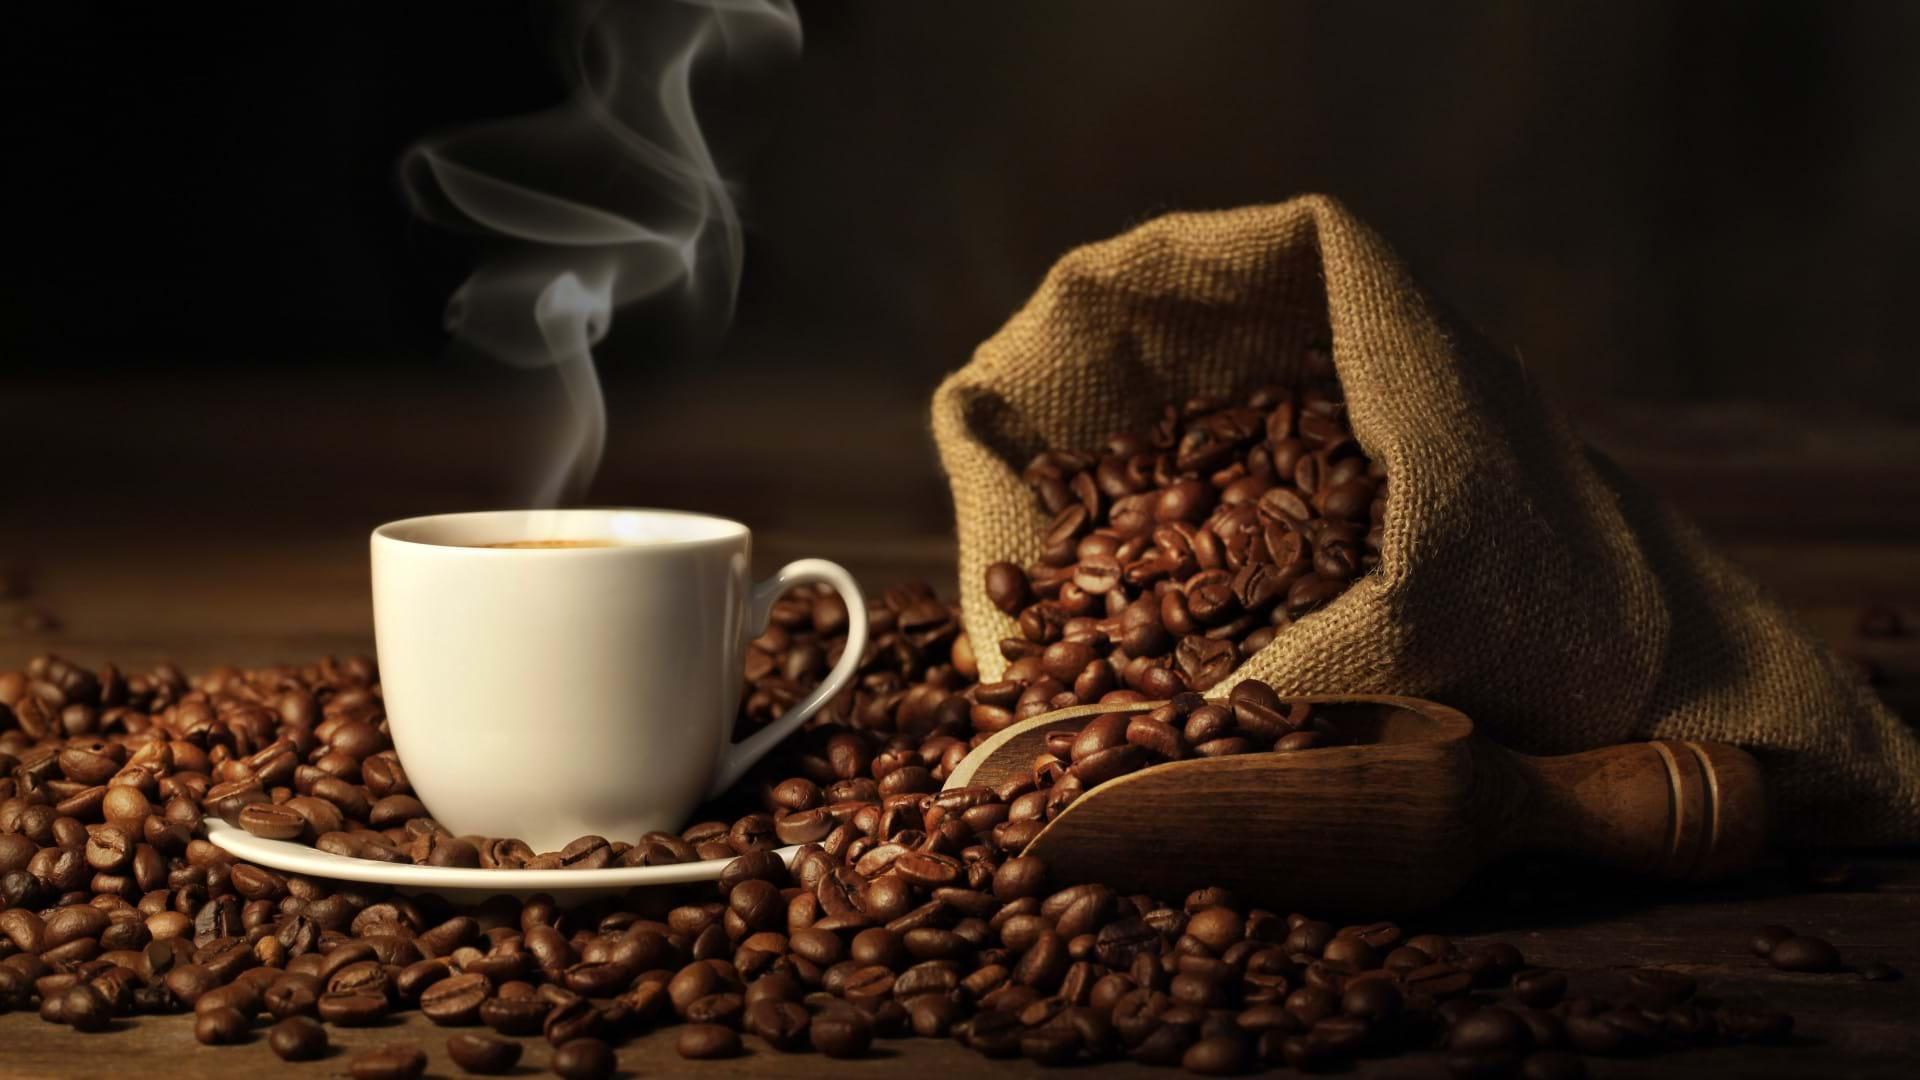 https://cdn-triplem.scadigital.io/media/31437/nilgiri-coffee-online-ooty6.jpg